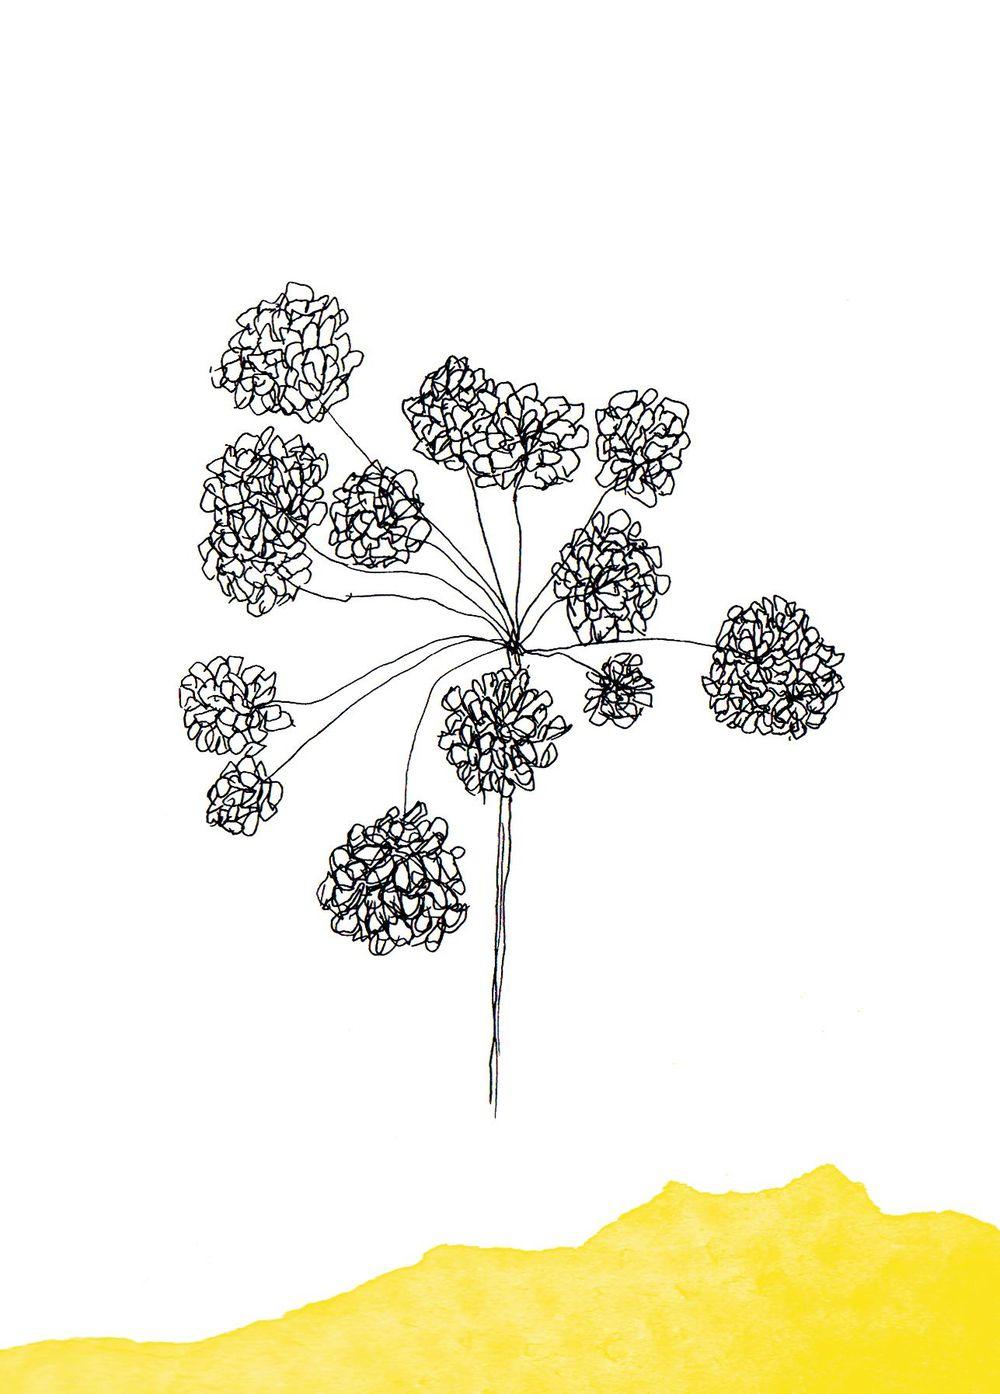 Botanical - image 2 - student project